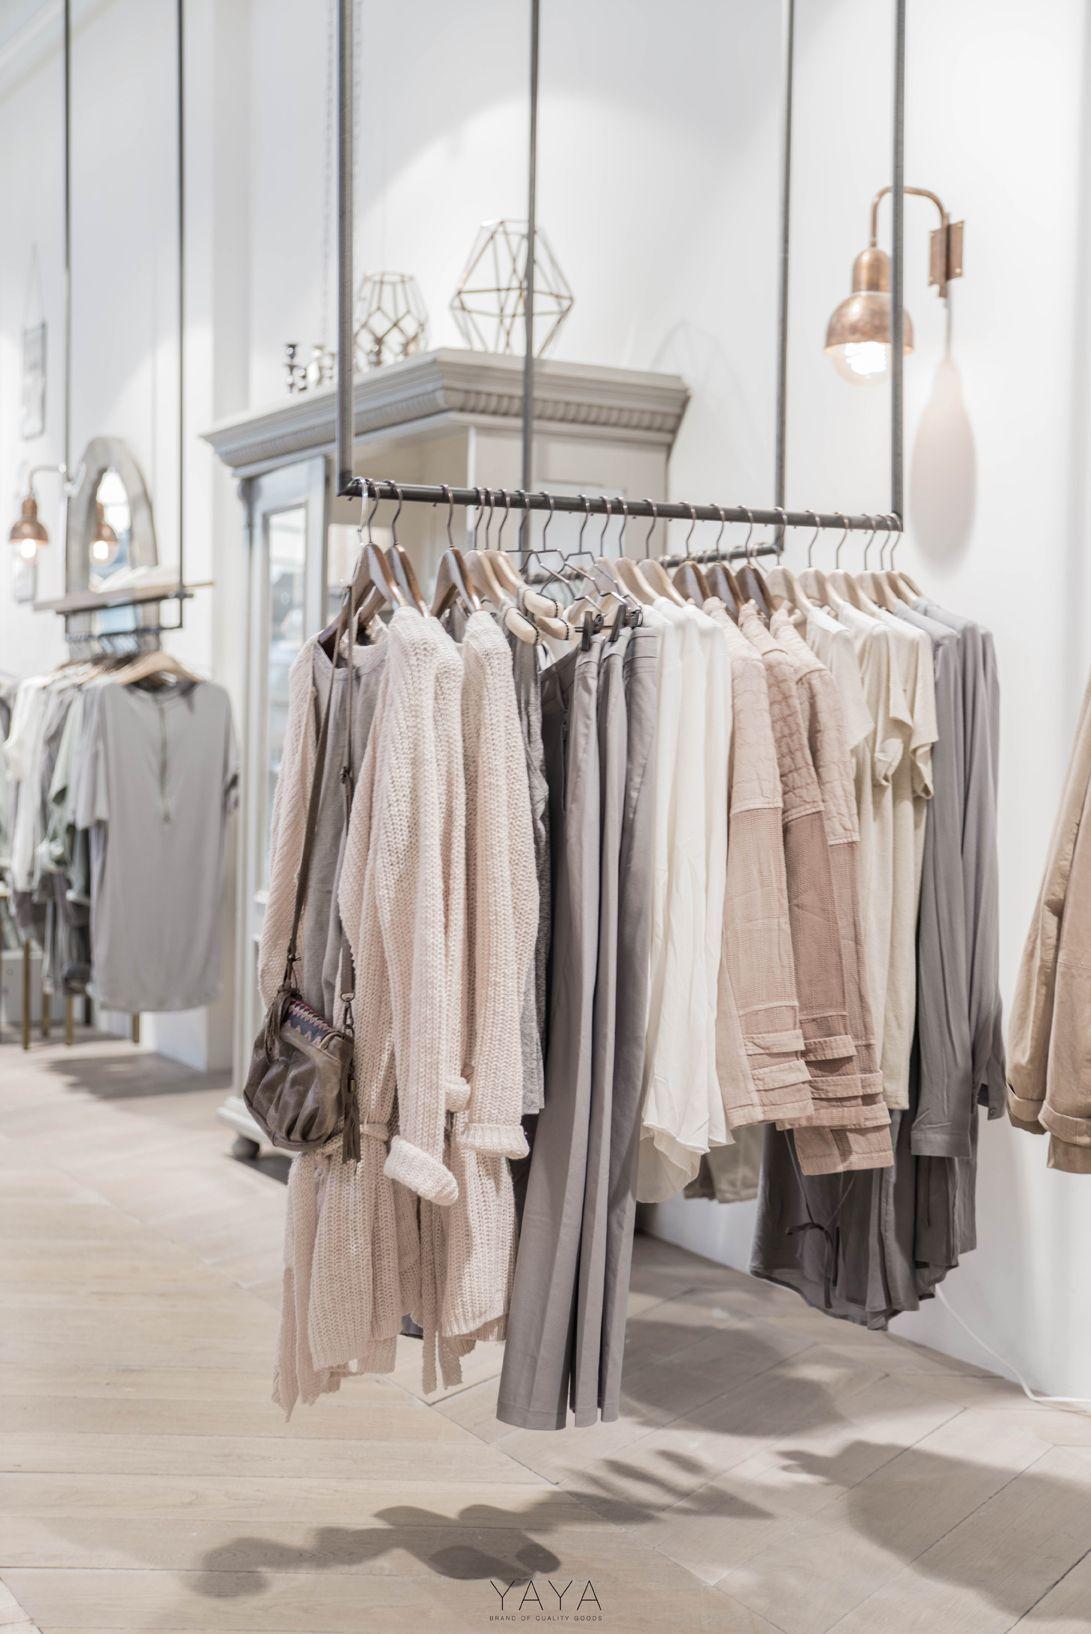 Yaya Concept Store Amstelveen Photography Paulina Arcklin Boutique Pinterest Store